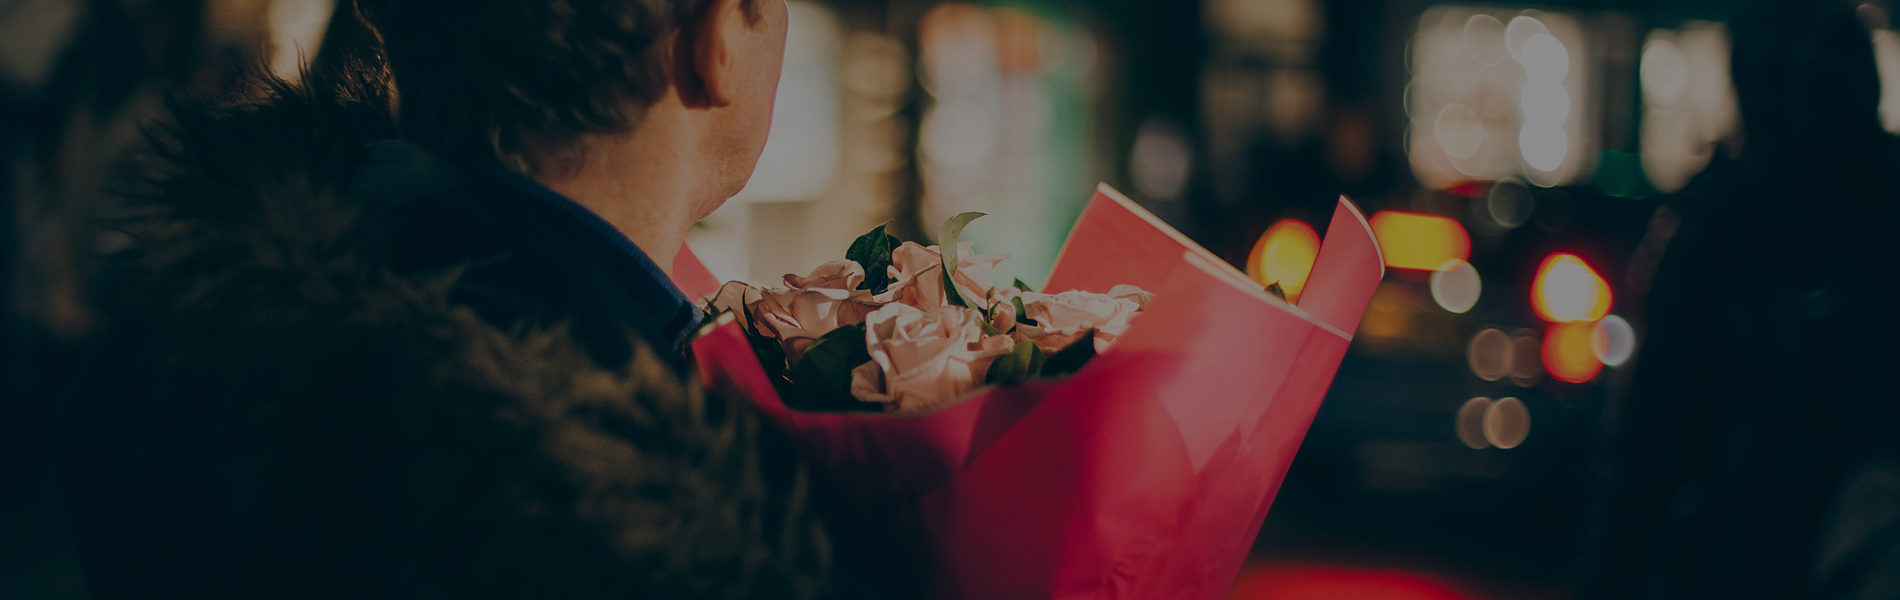 50-Affordable-Valentines-Day-Gifts-hero-desktop-1900x600.jpg